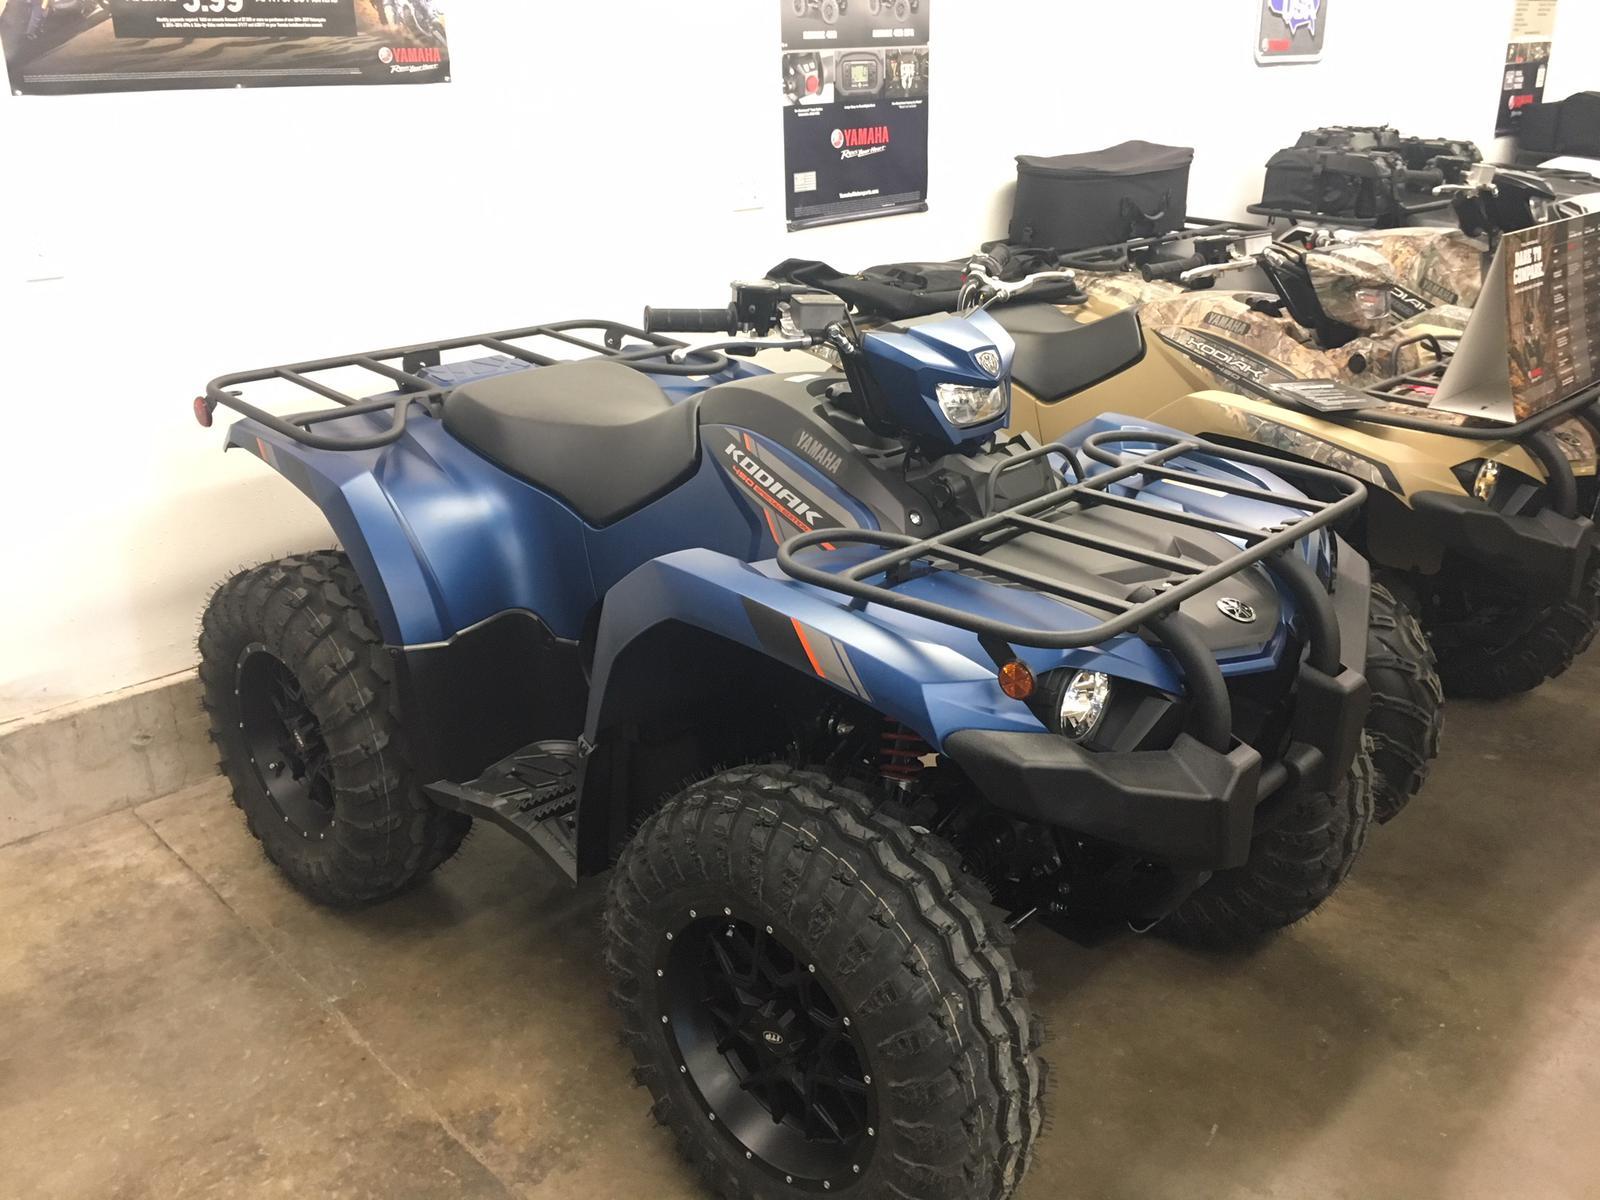 2019 Yamaha Kodiak 450 EPS SE for sale in W Burlington, IA  Pro